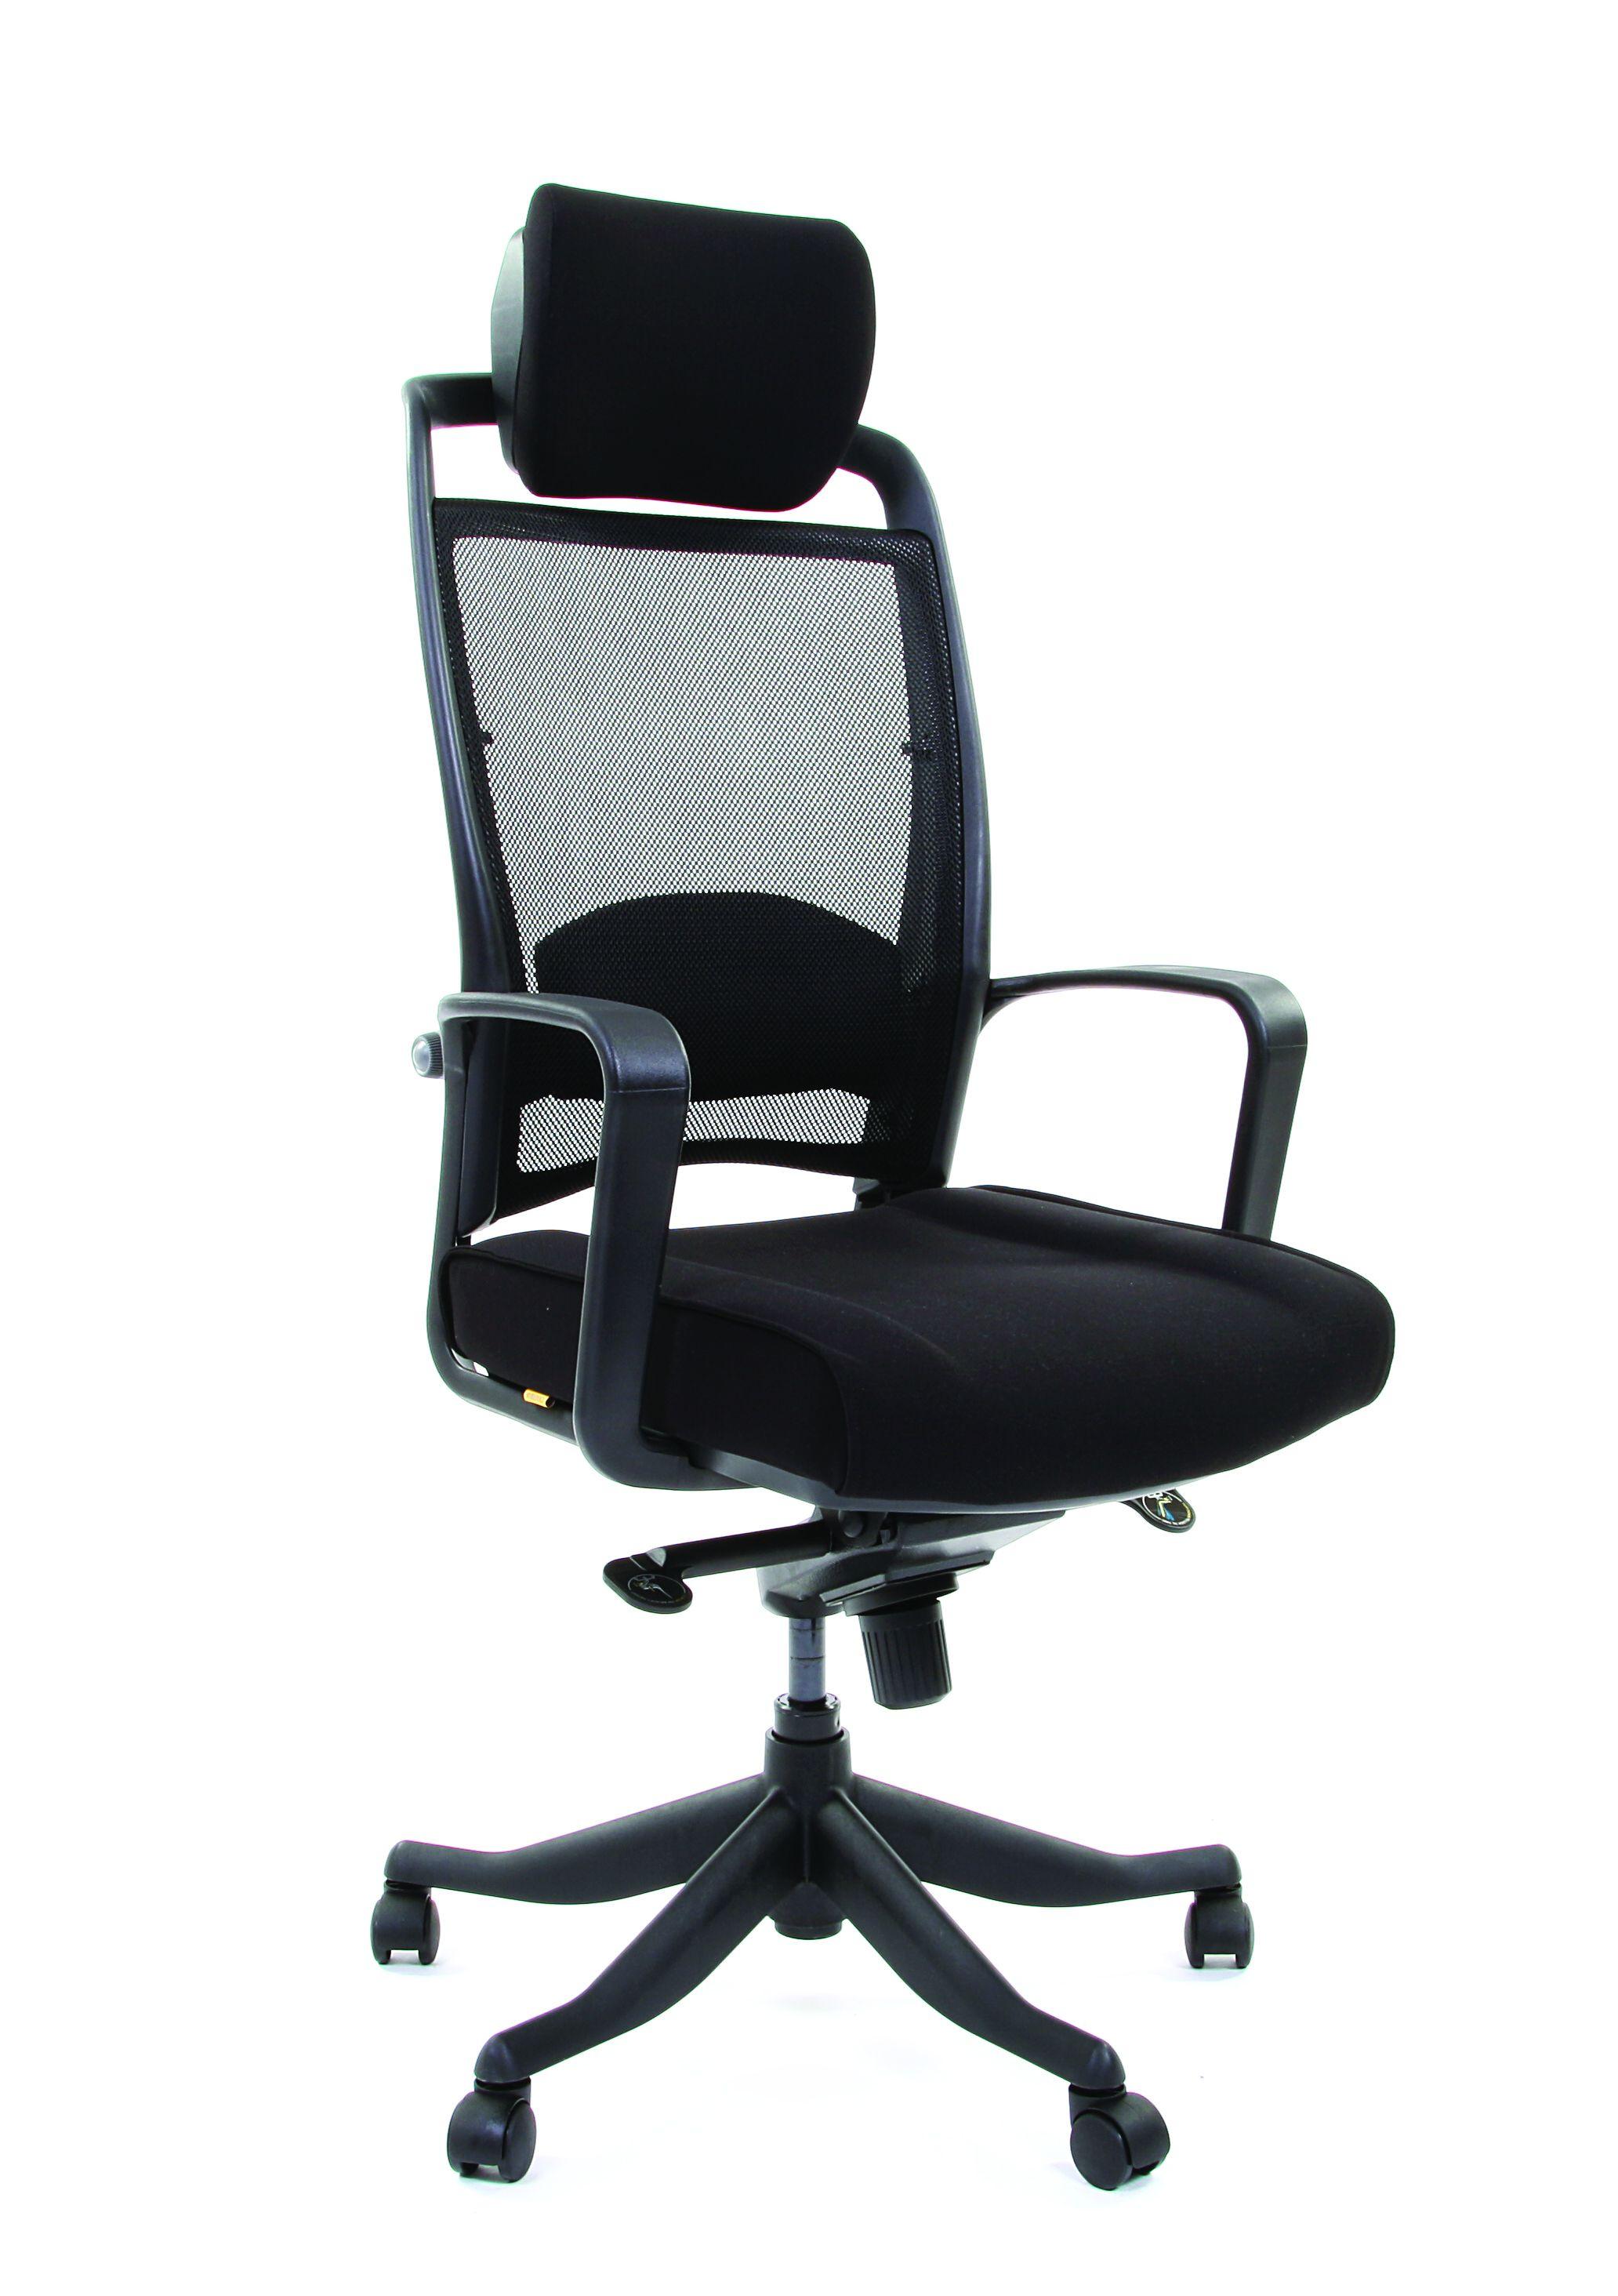 Biuro kėdė SARATOGA 283